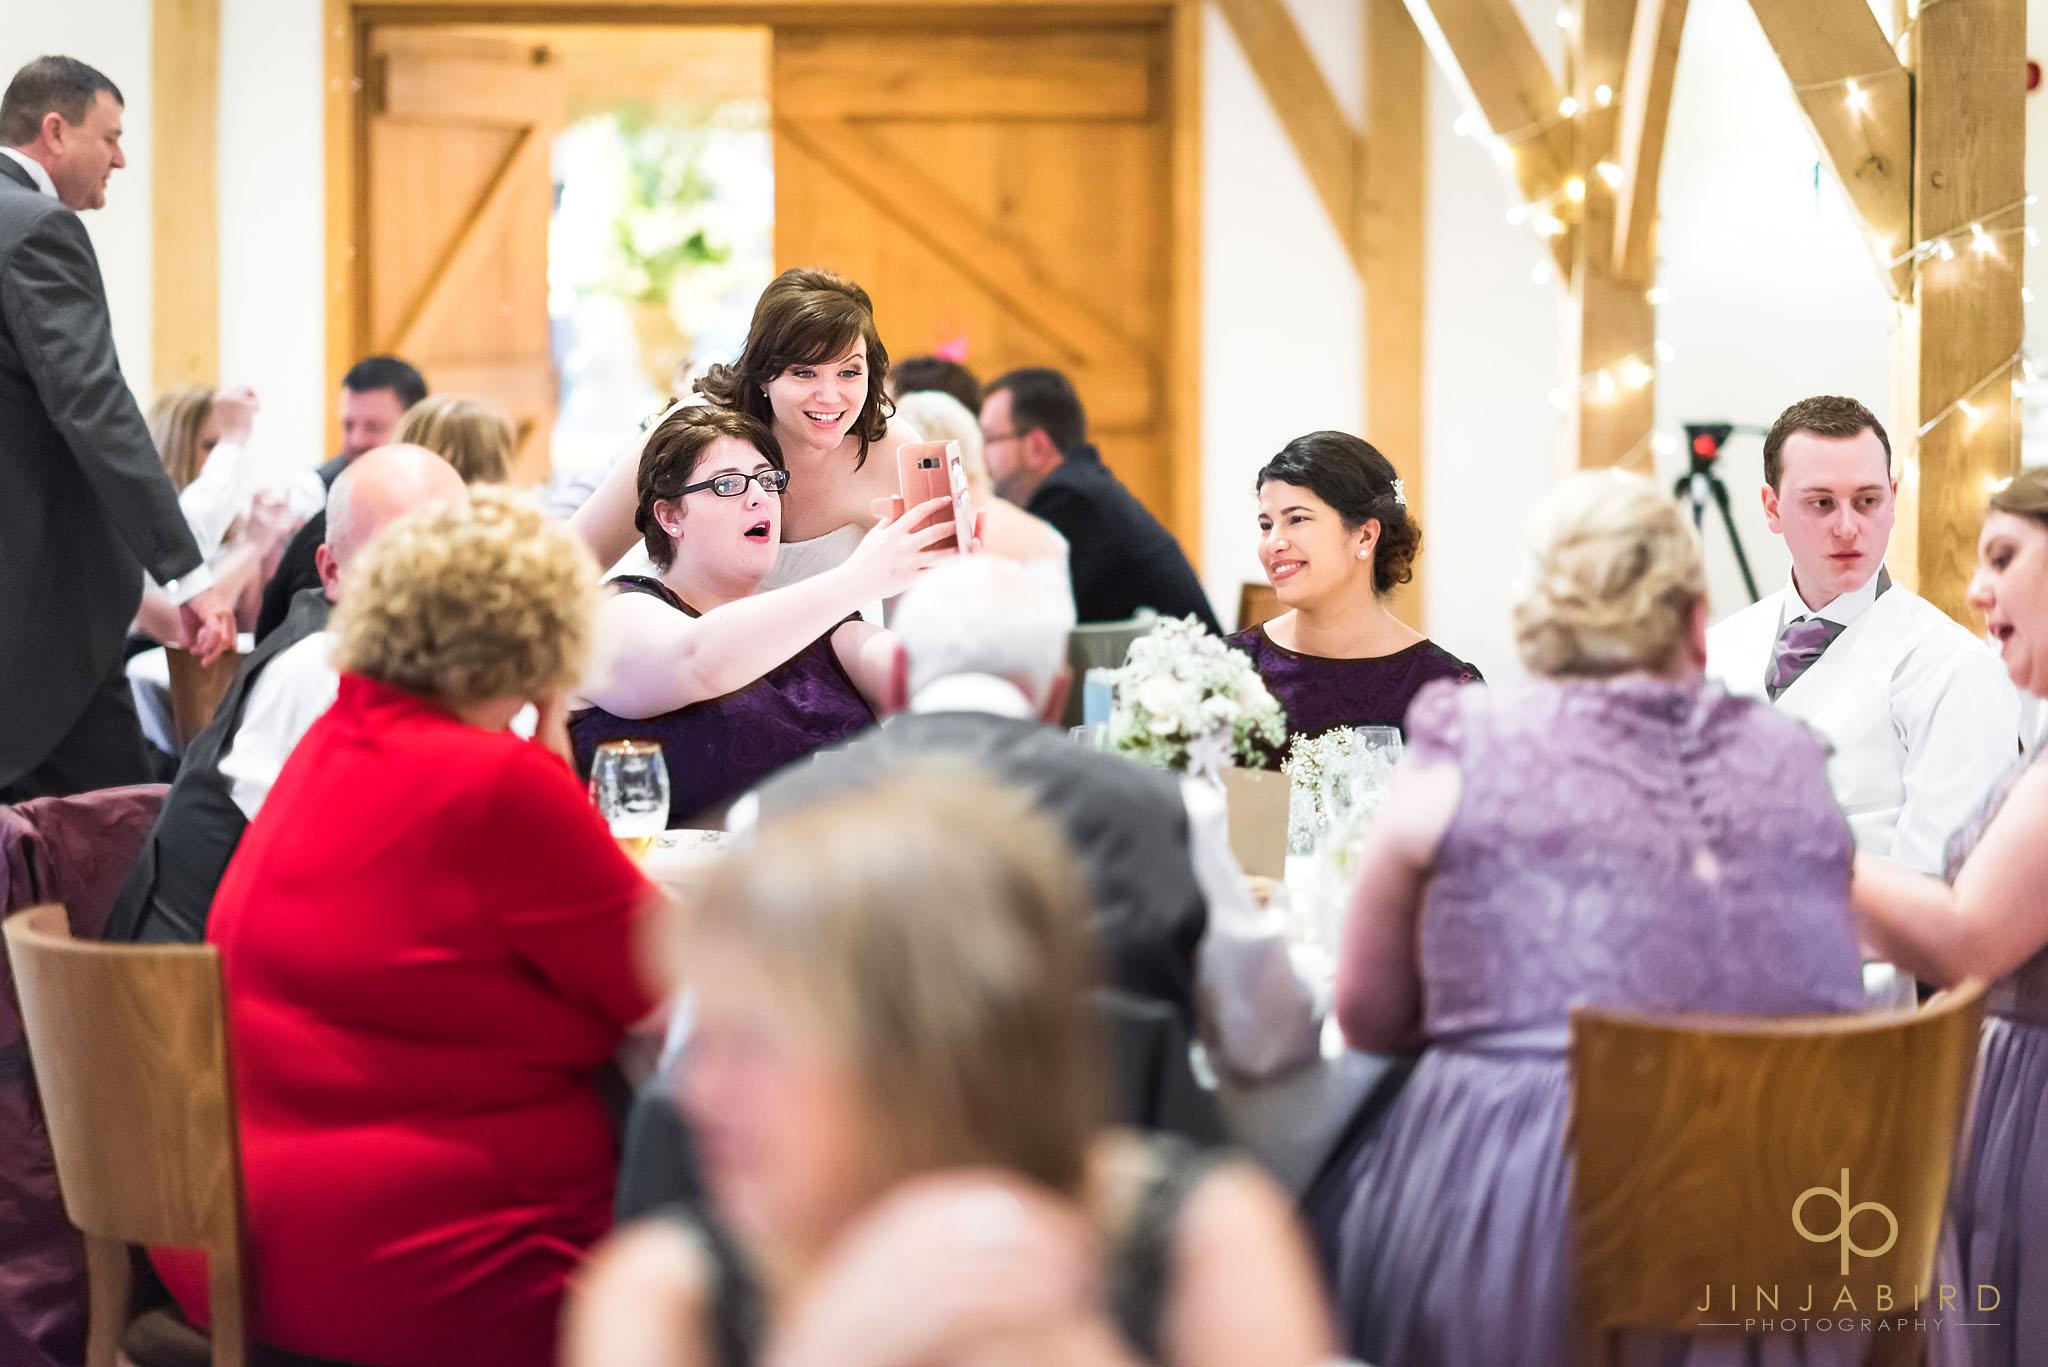 bride during wedding breakfast with bridesmaid